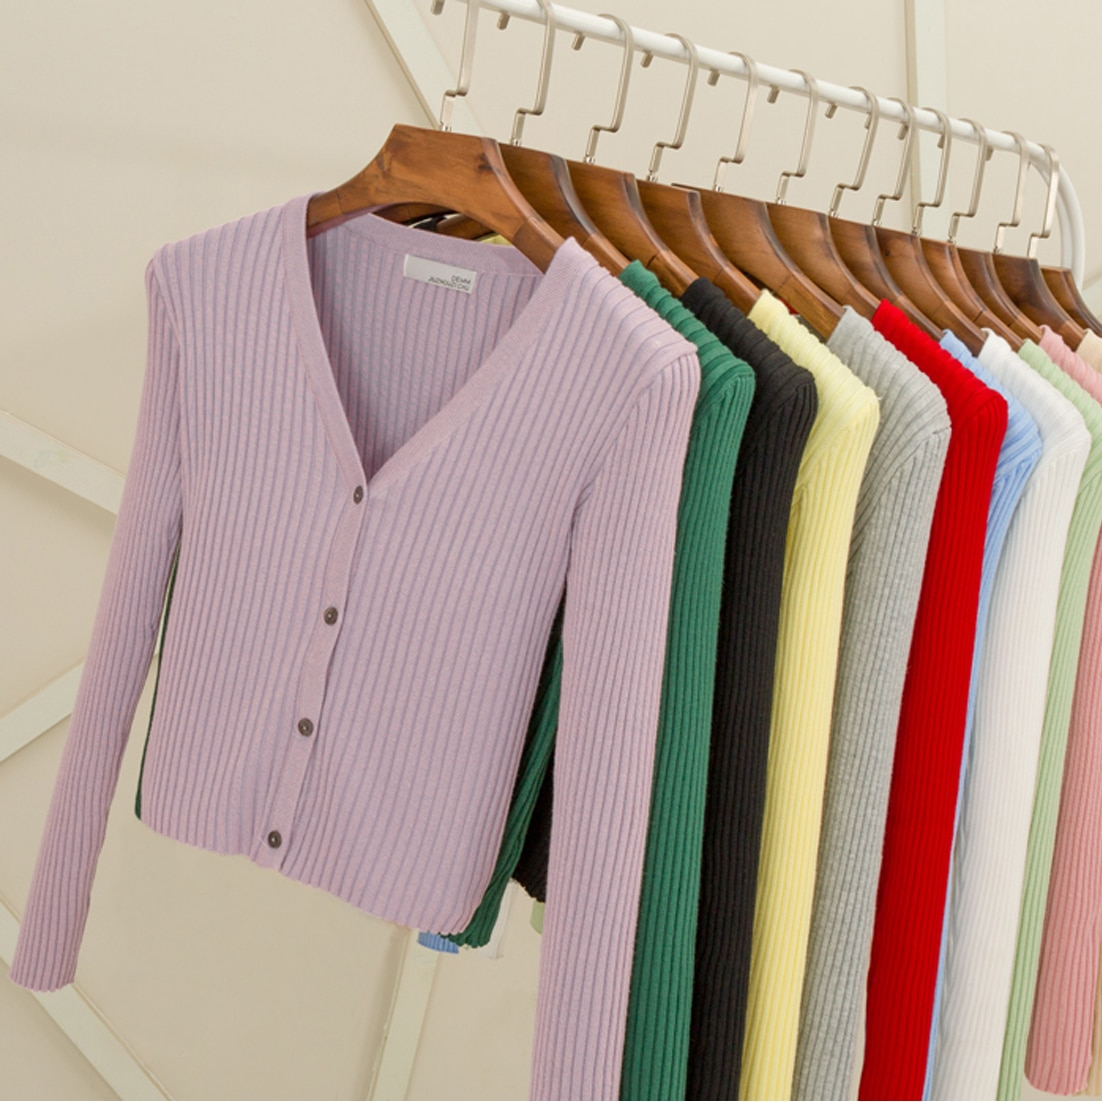 LEOSOXS, suéteres para mujer, Tops de punto con botones, cárdigans acanalados, ropa de abrigo de punto de manga larga ajustada sexi para mujer, suéter de otoño